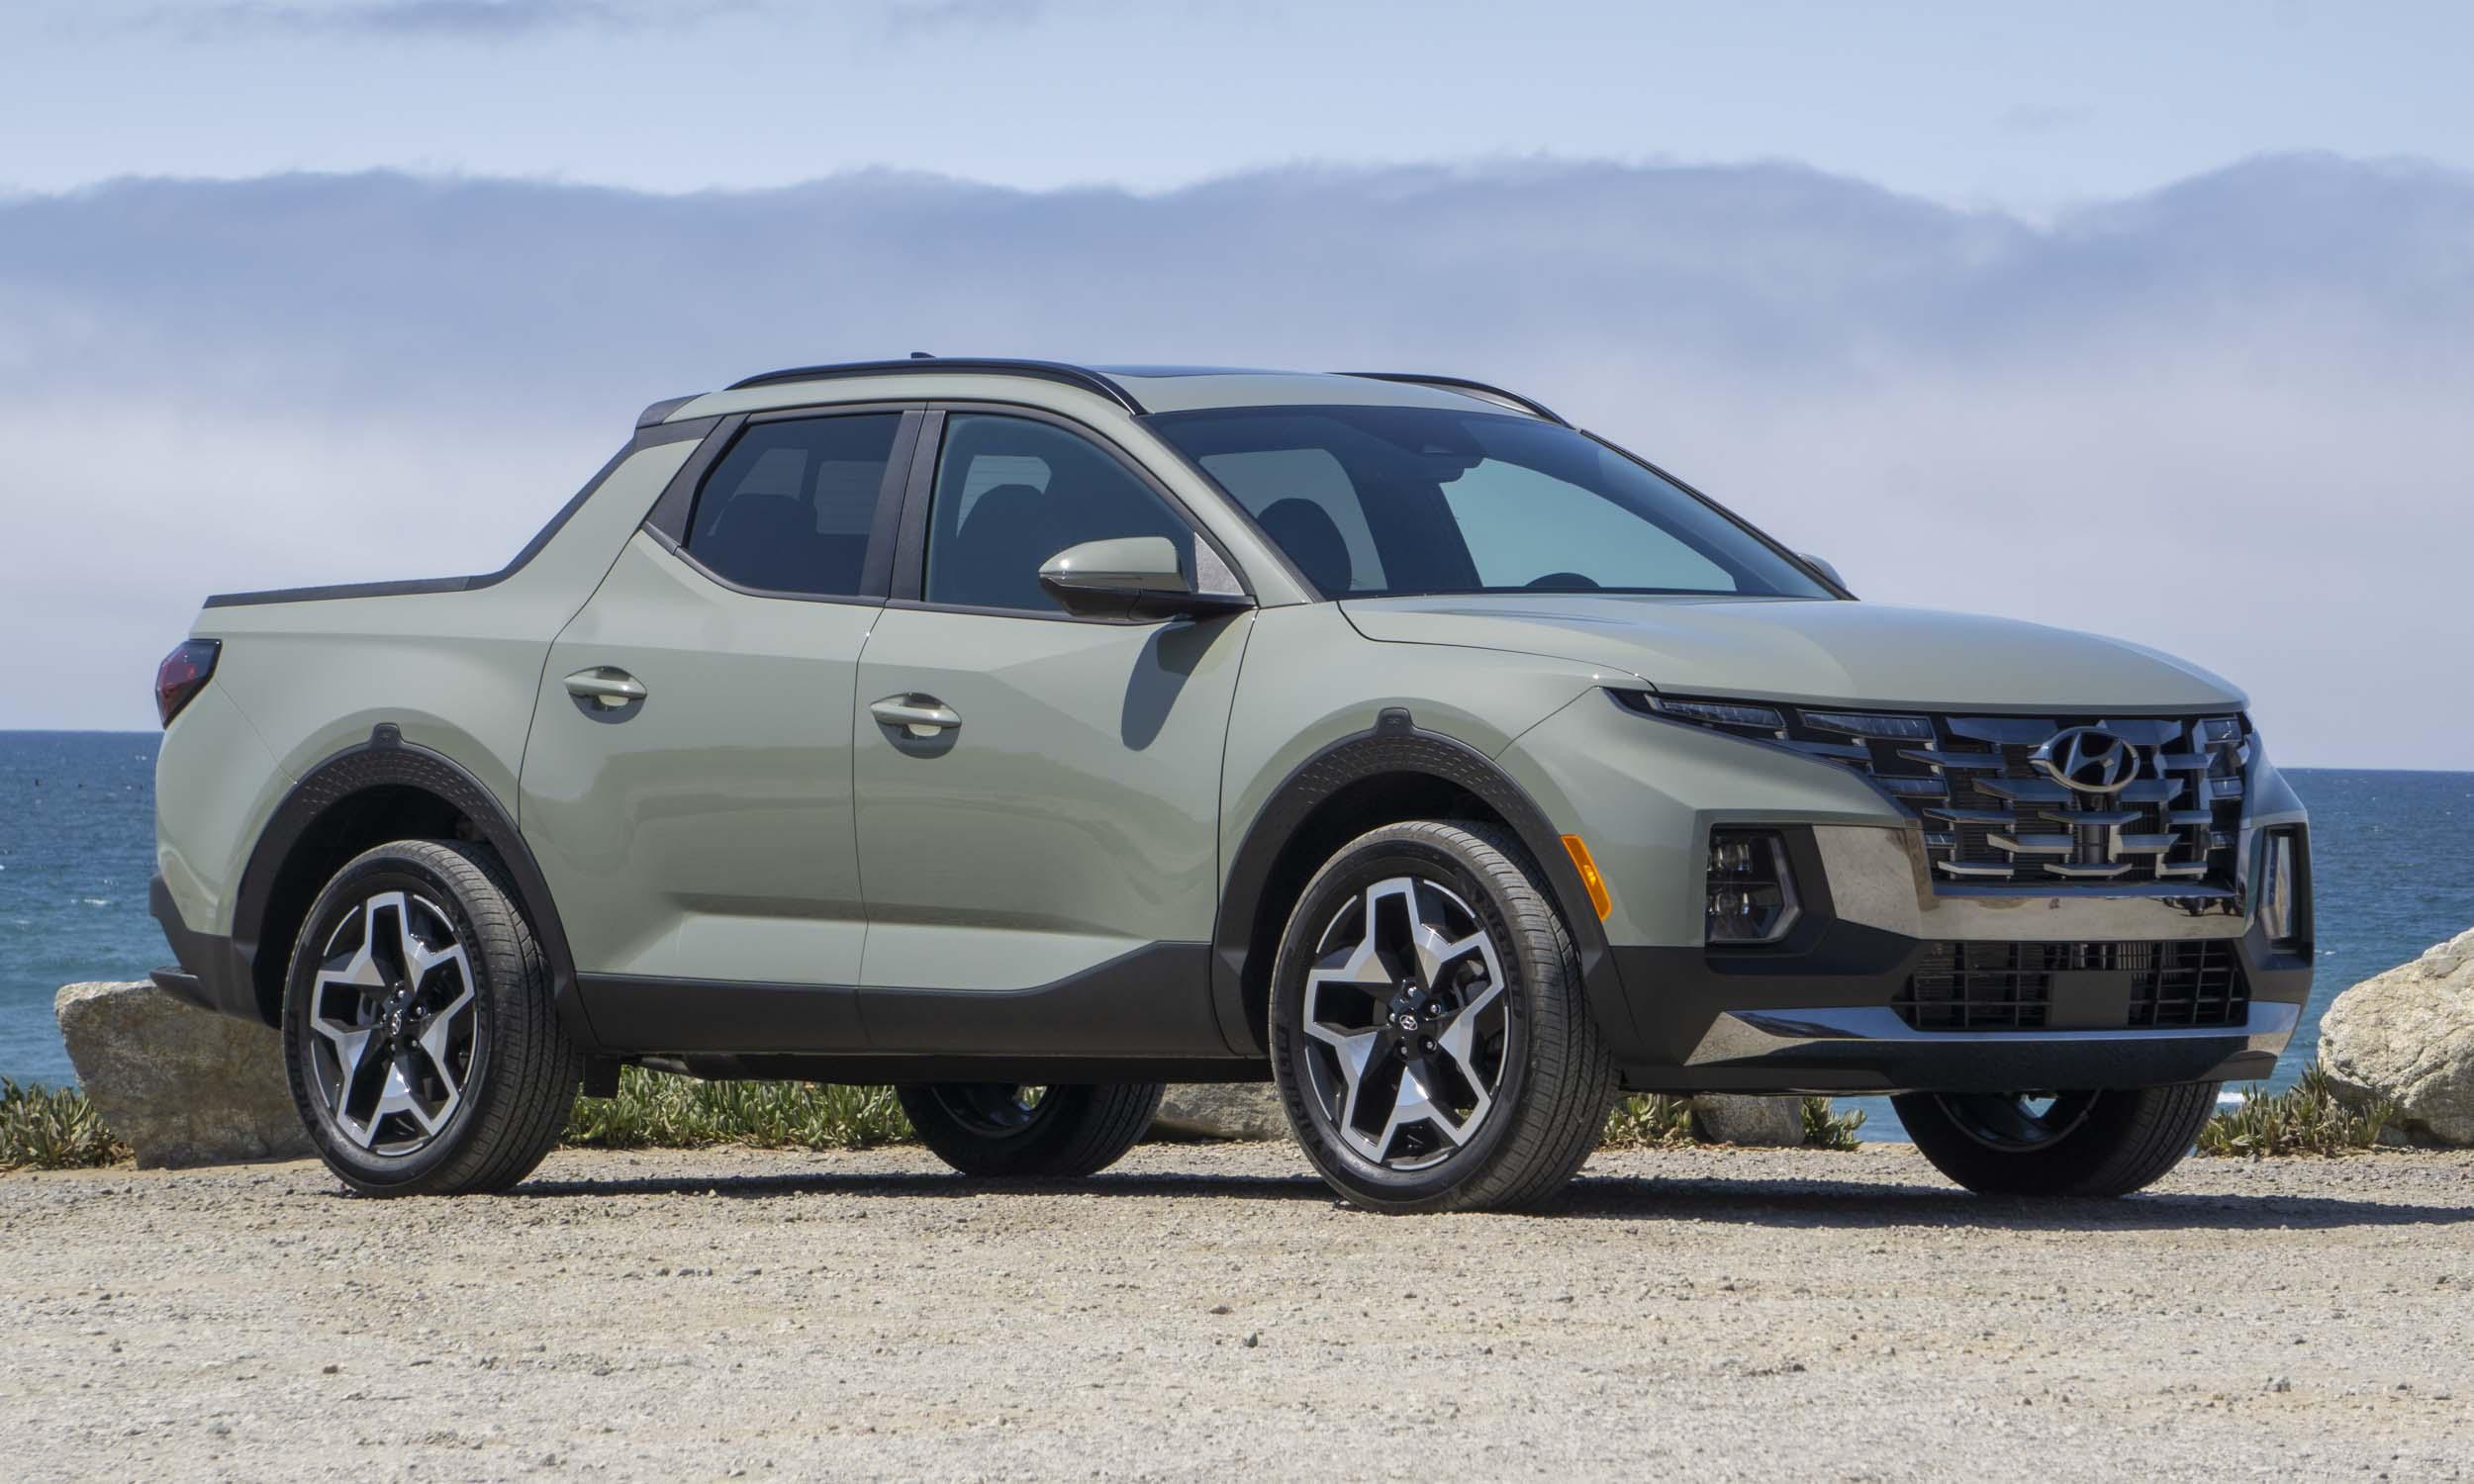 2022 Hyundai Santa Cruz: First Drive Review